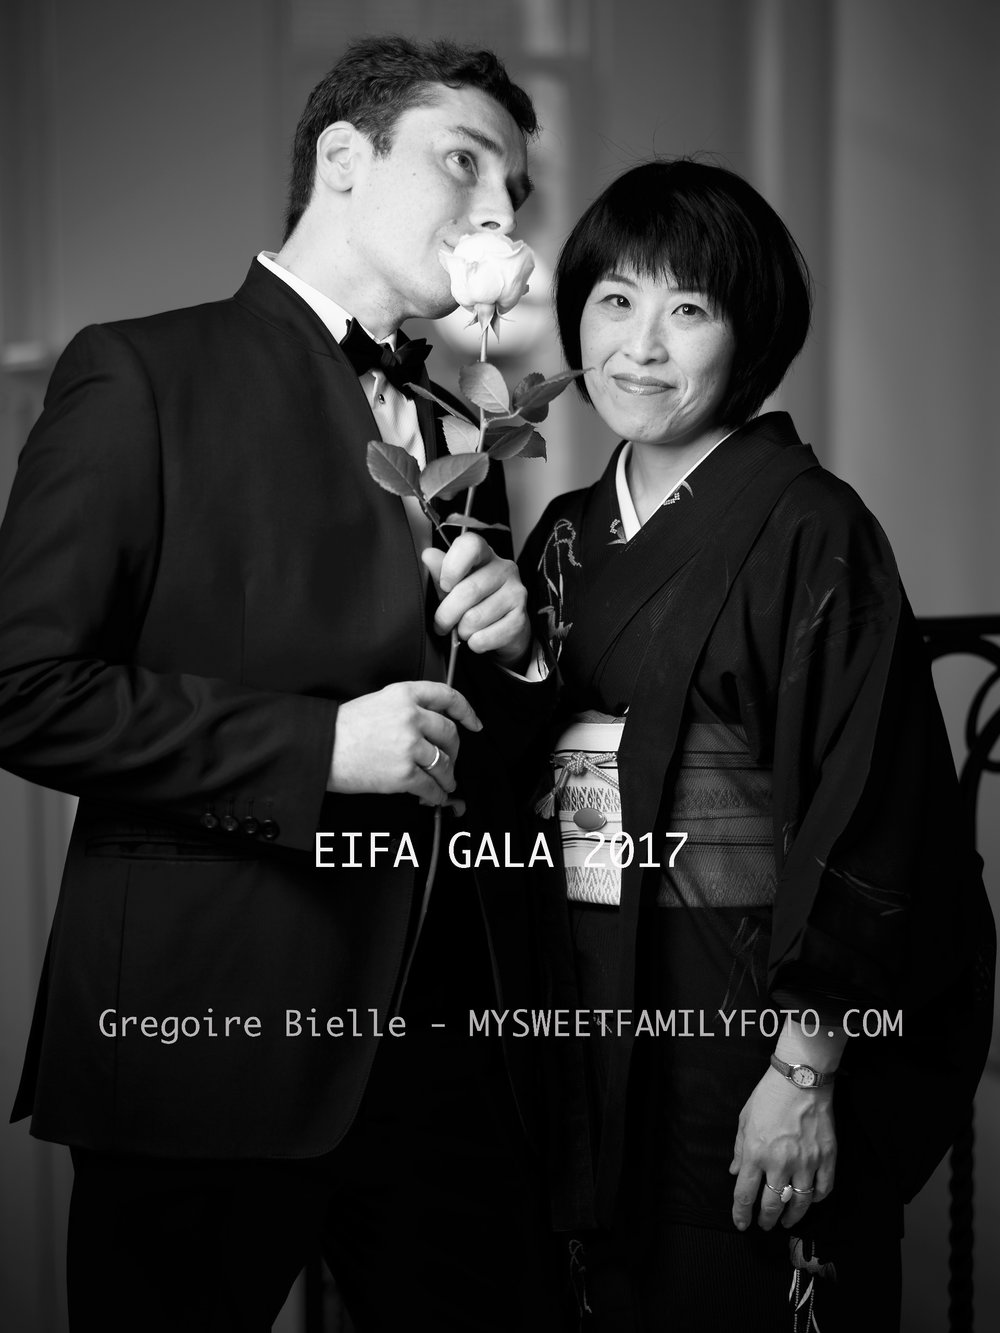 EIFA GALA 1011.jpg